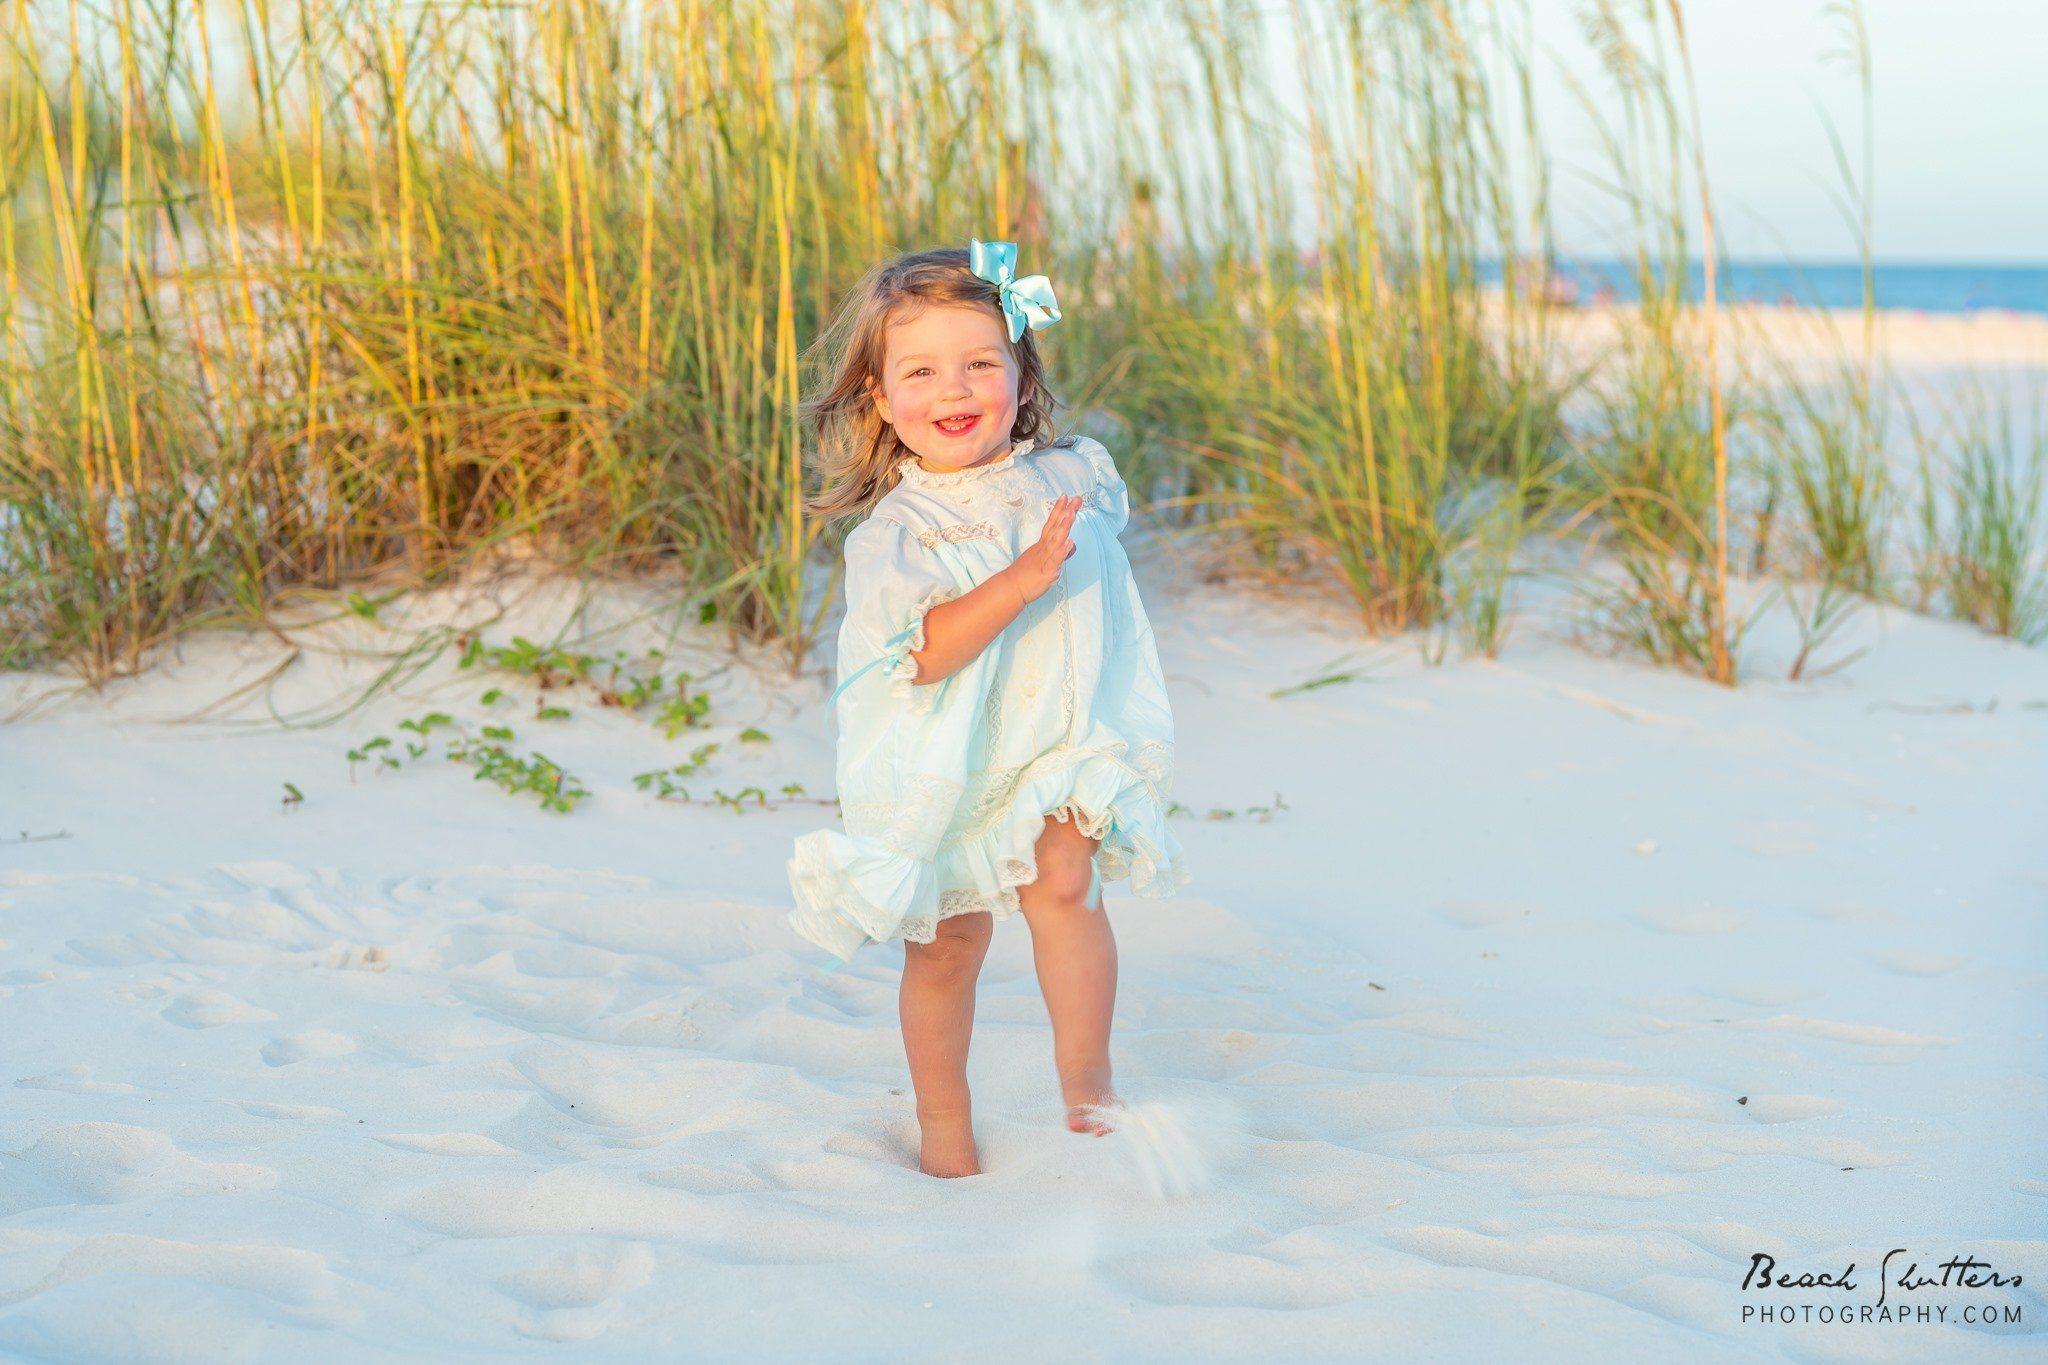 photos boost your child's self-esteem